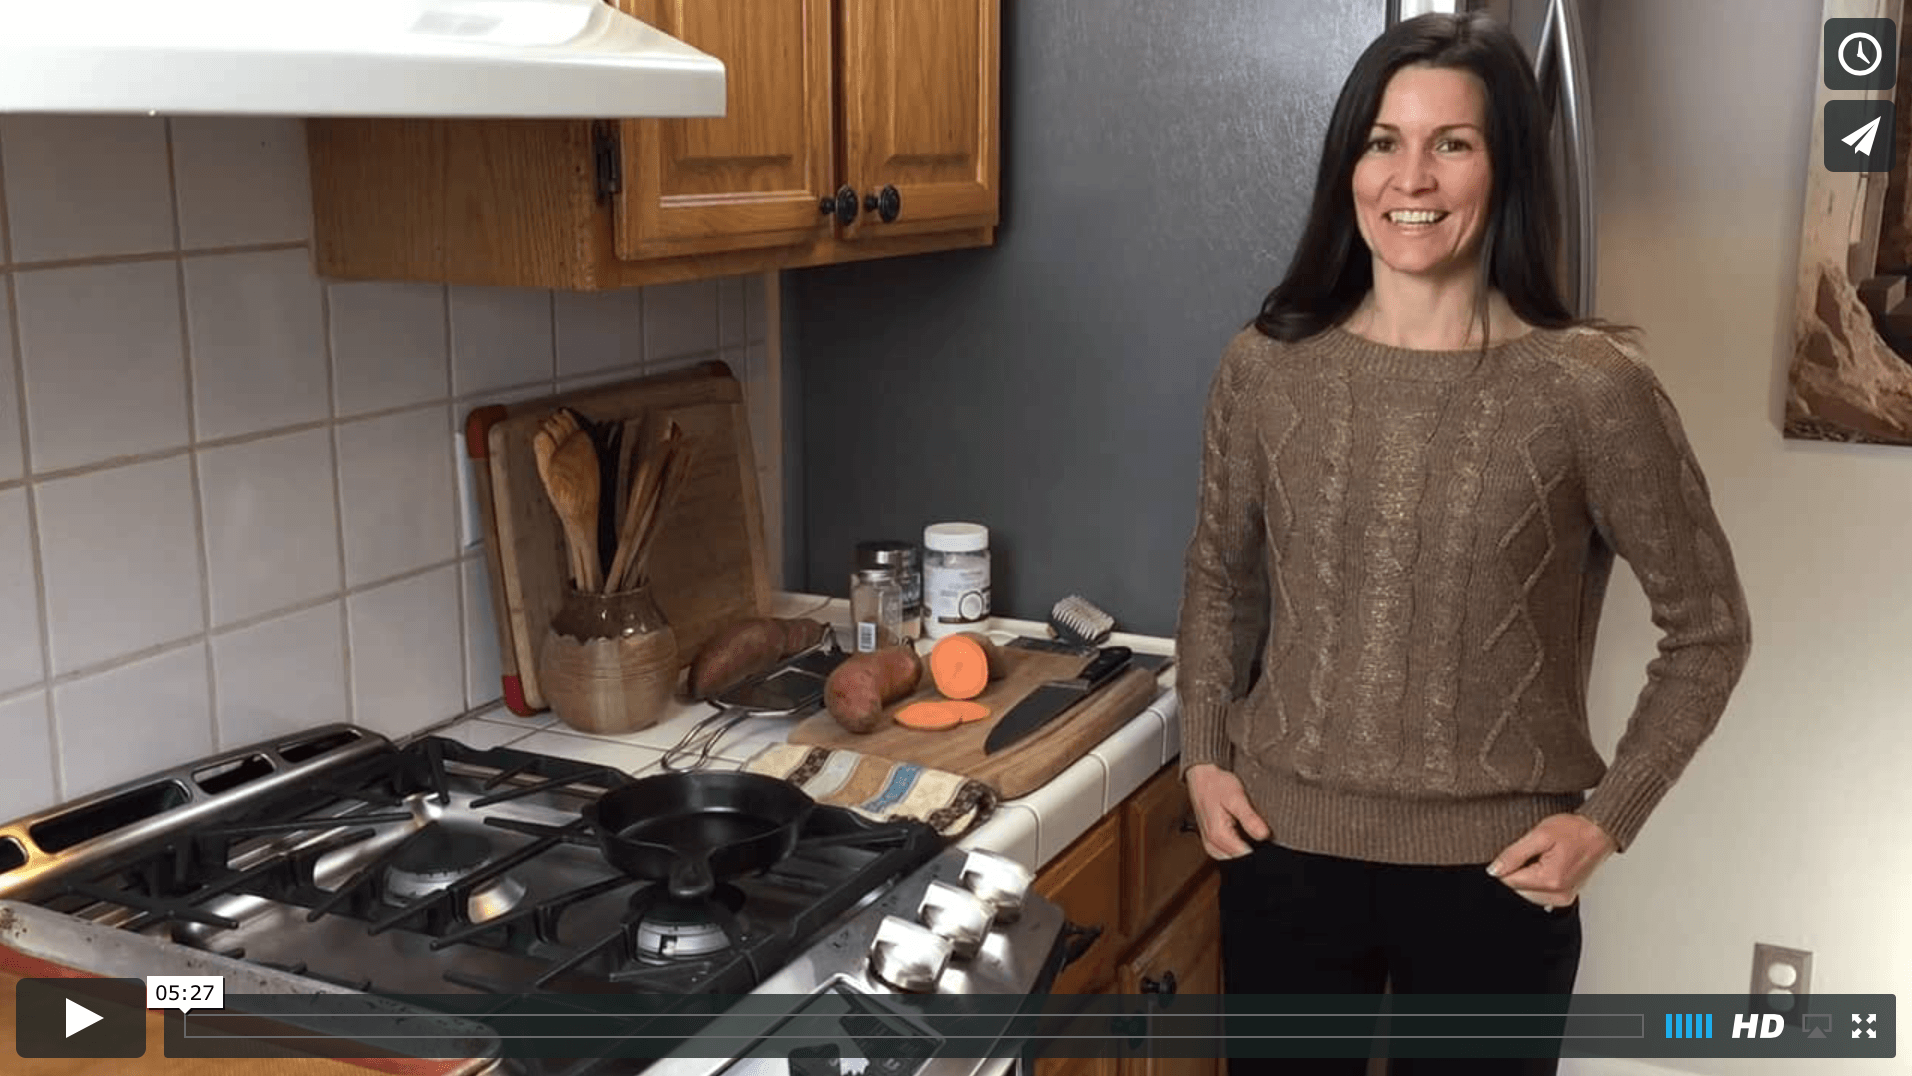 Kitchen-Ninja-Sweet-Potato-Coins-Preview.png